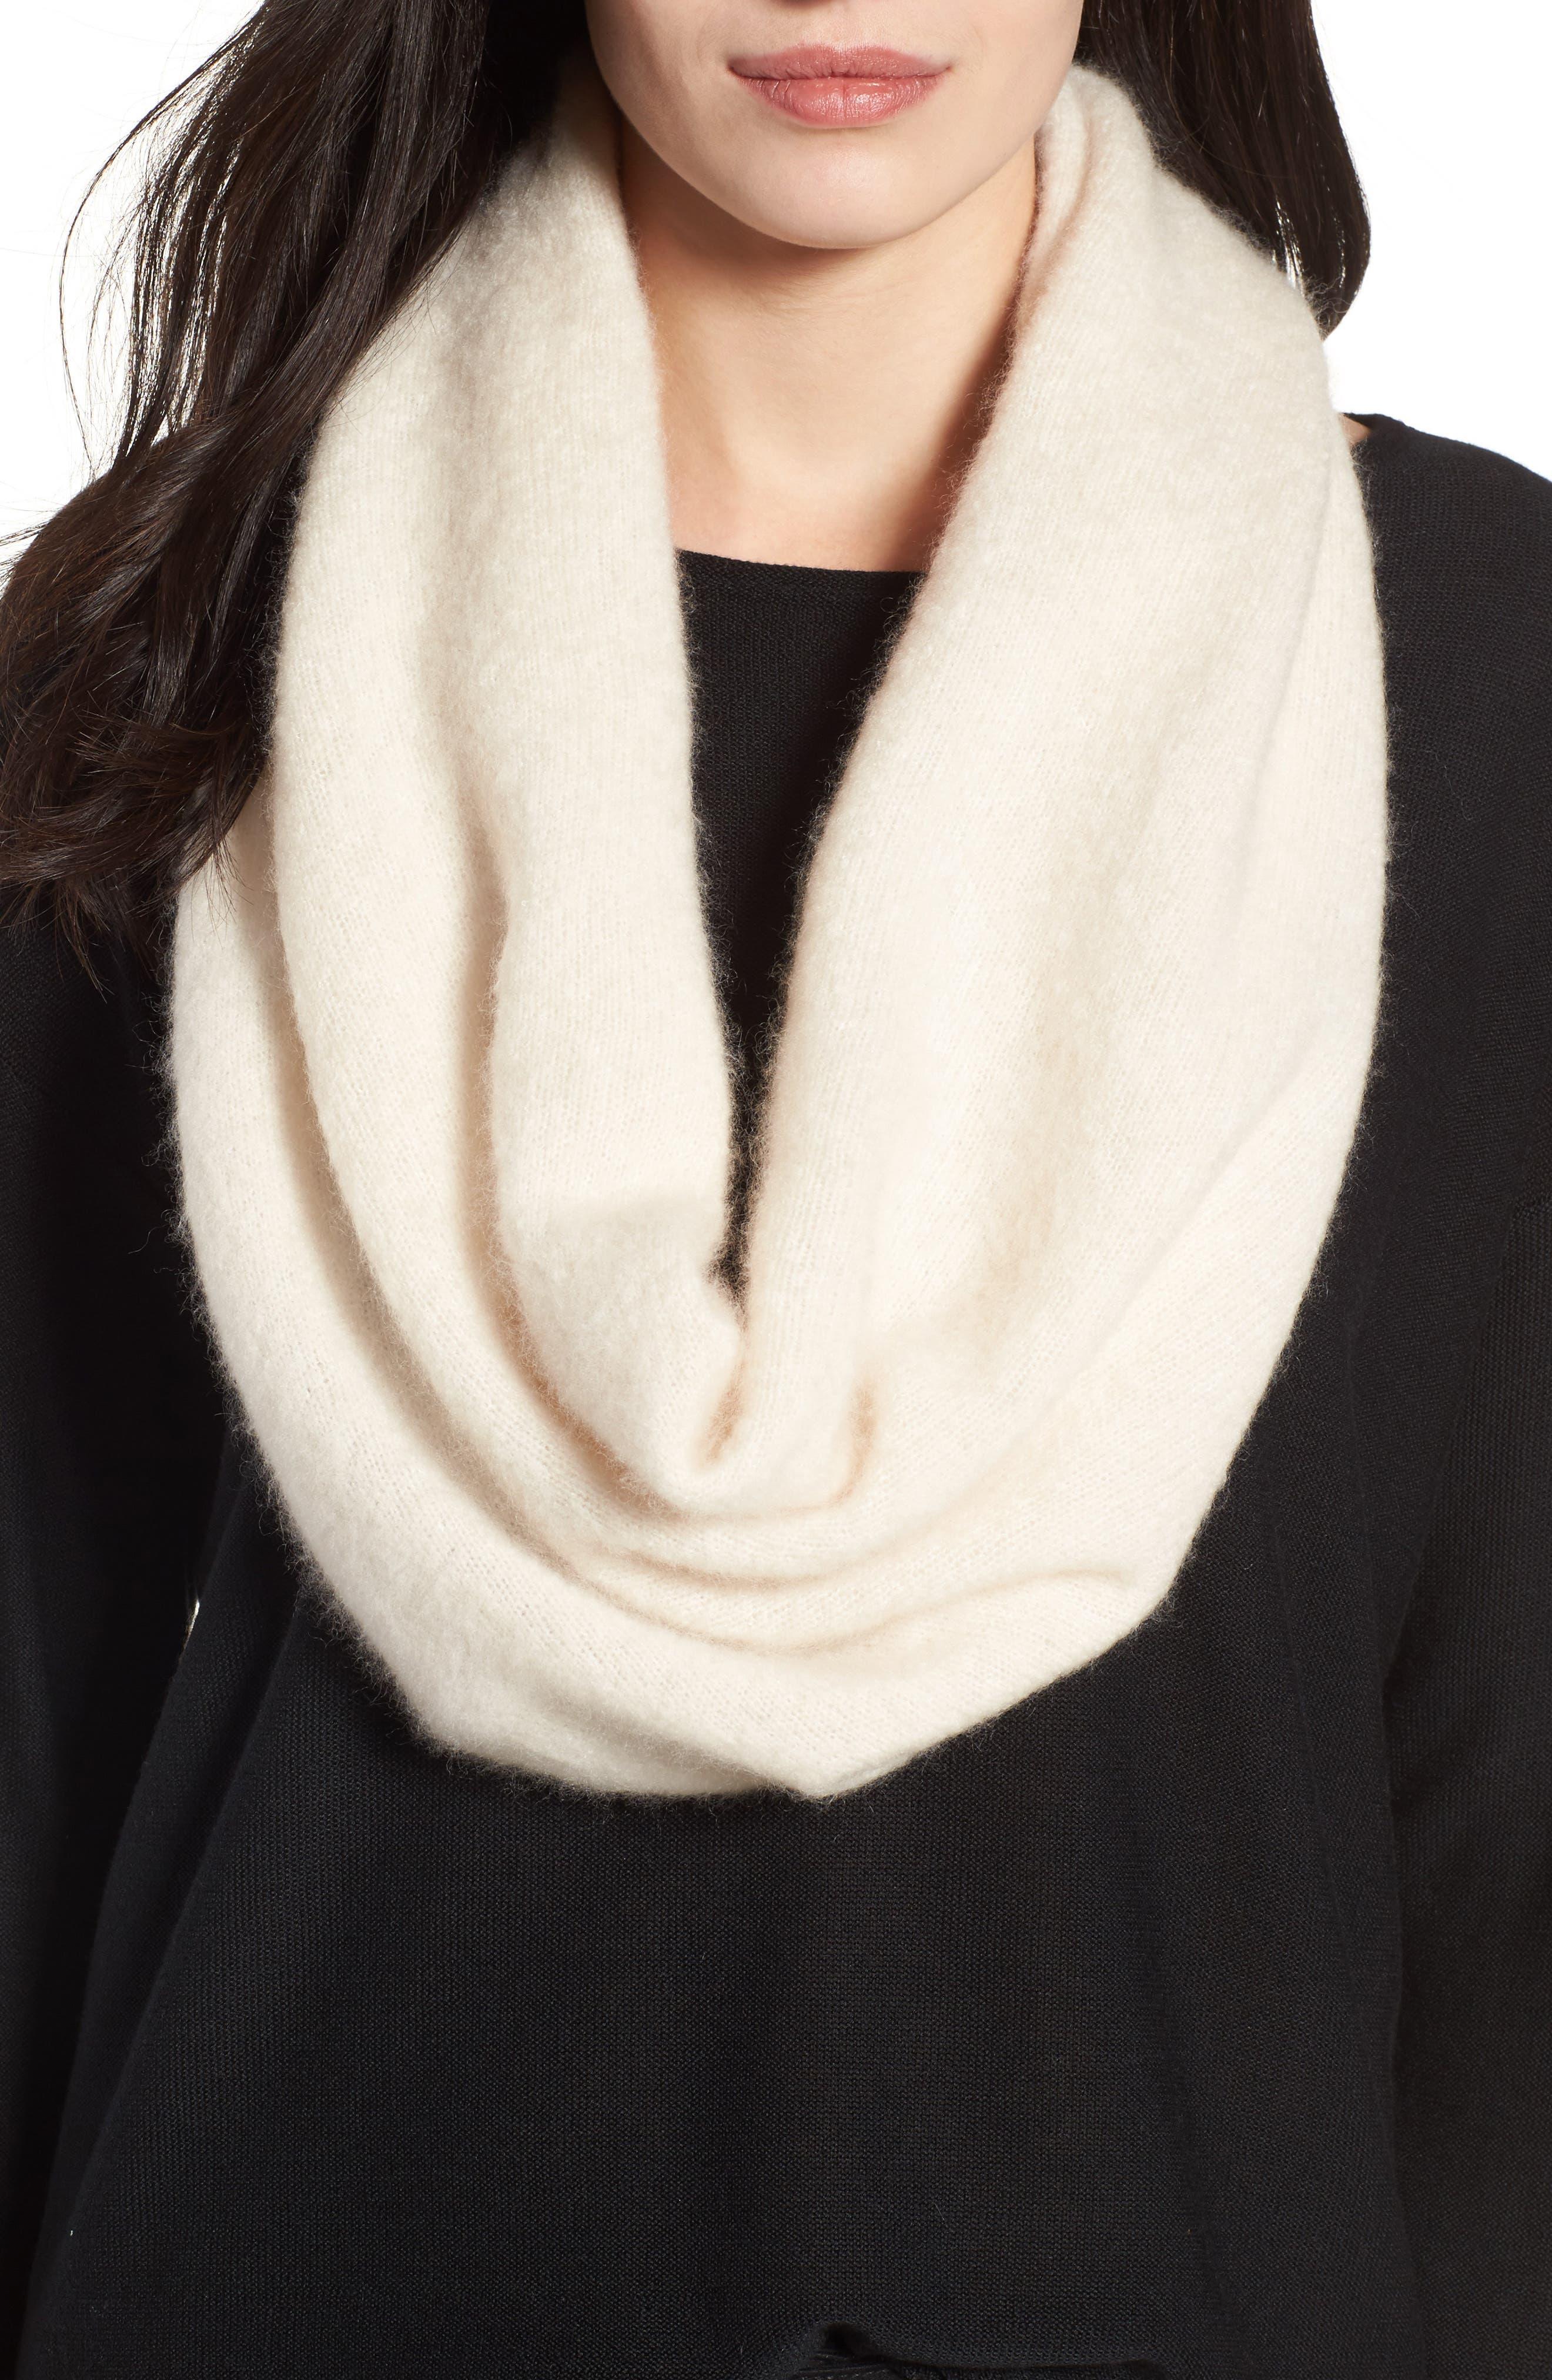 Cashmere Blend Cowl Scarf,                             Main thumbnail 1, color,                             Soft White